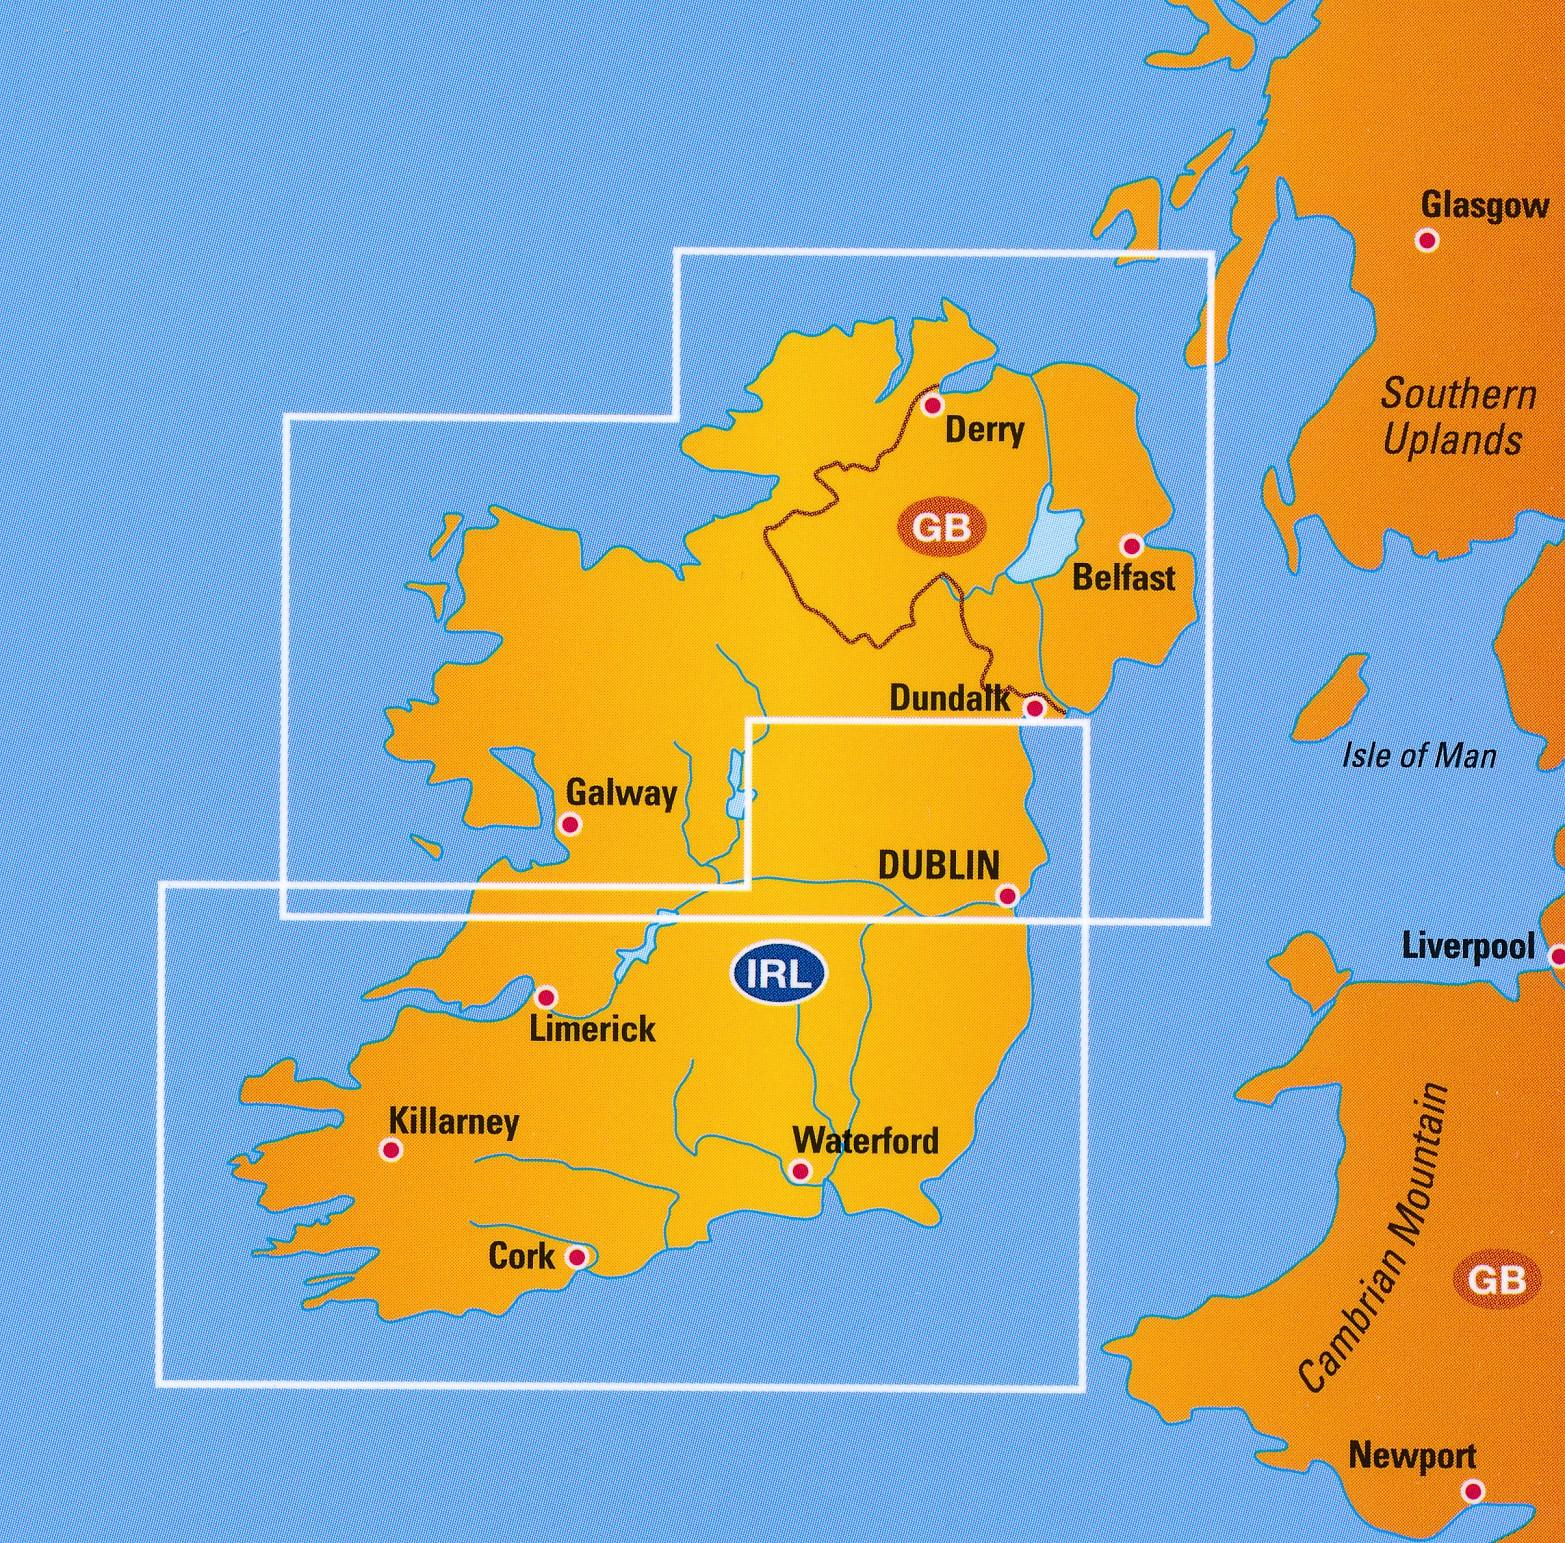 Wegenkaart Landkaart 2 Ierland Anwb Media 9789018042684